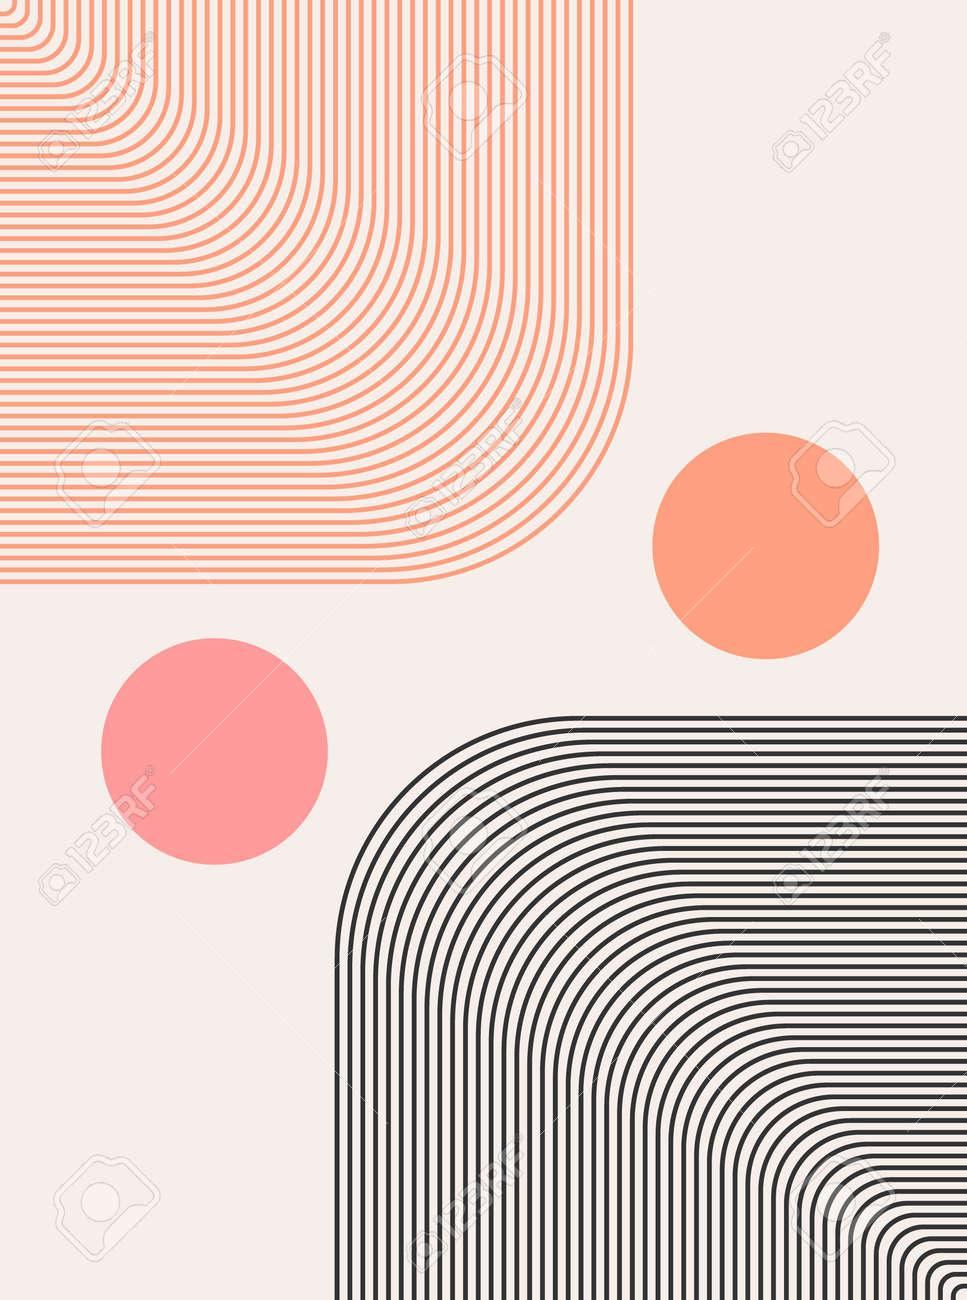 Abstract modern bohemian contemporary geometric minimal pattern art style. Wall line boho abstract shape arch - 168953173